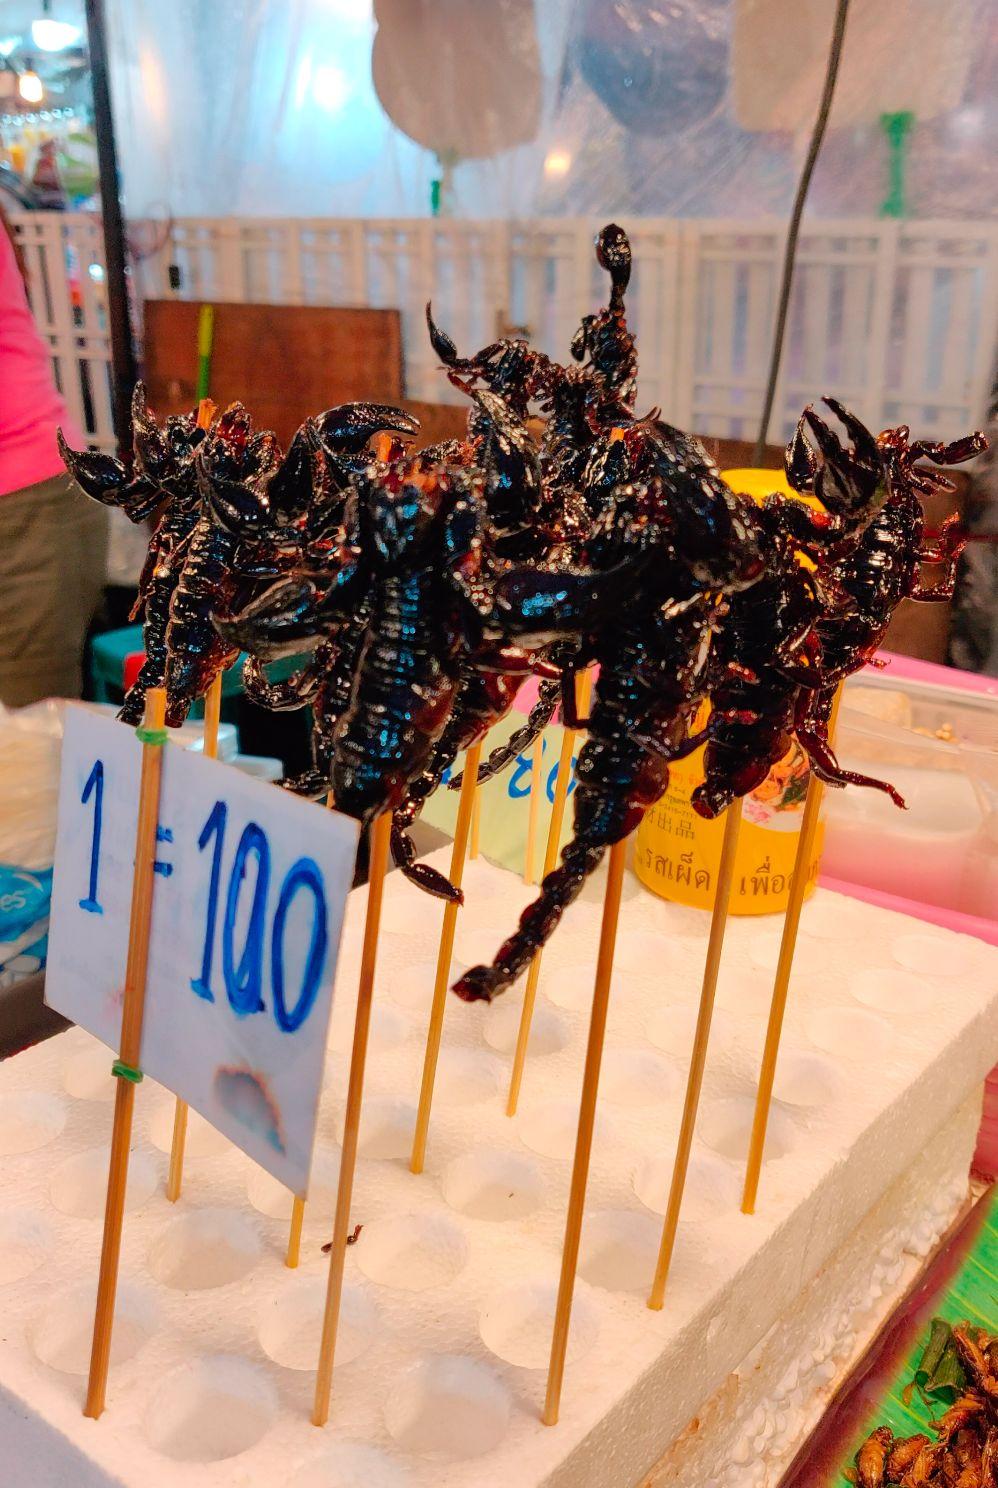 Fried Scorpians